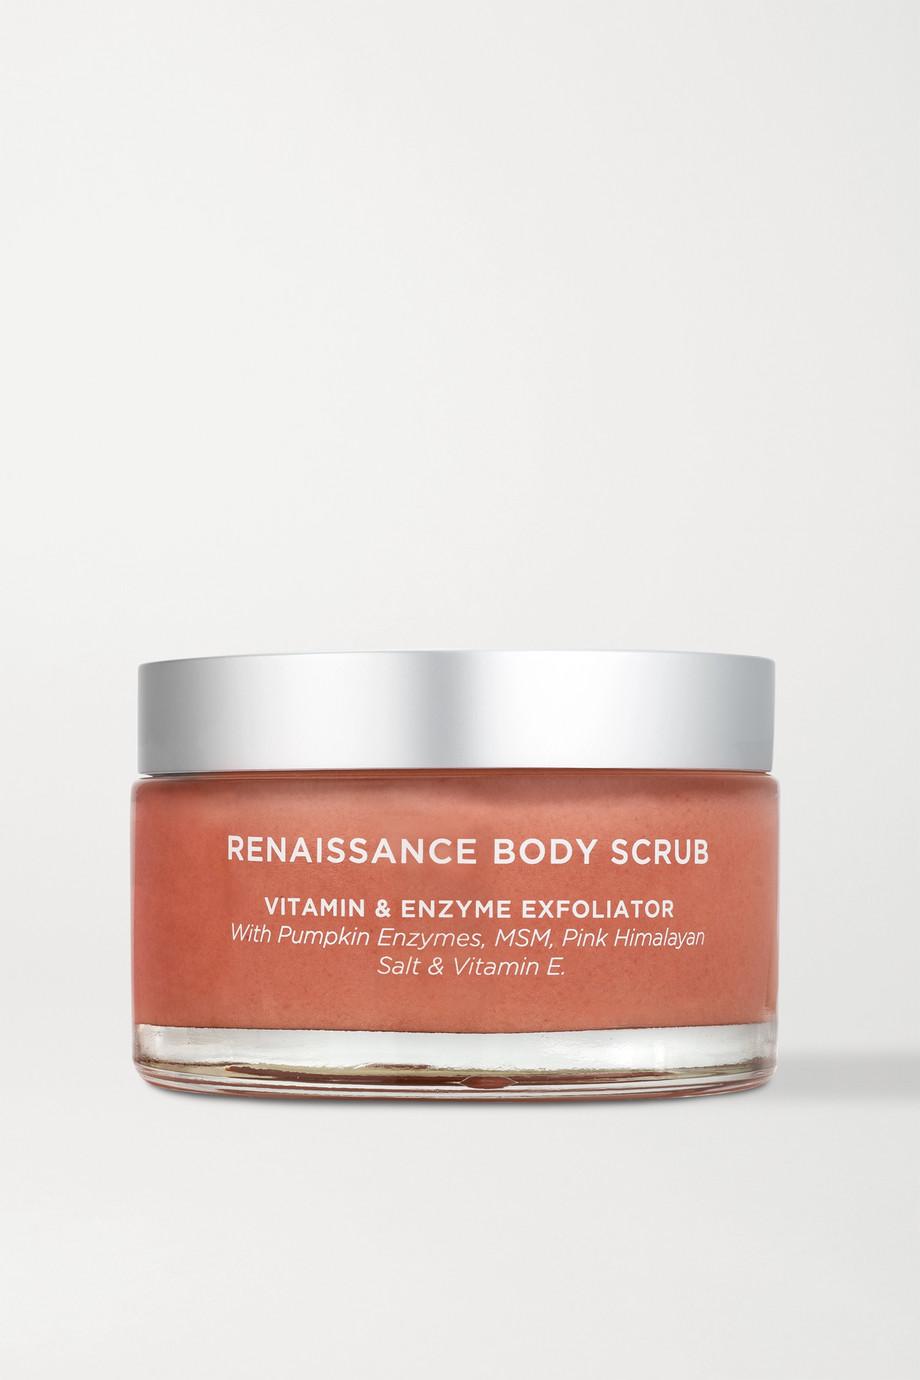 Oskia Renaissance Body Scrub, 220 g – Körperpeeling